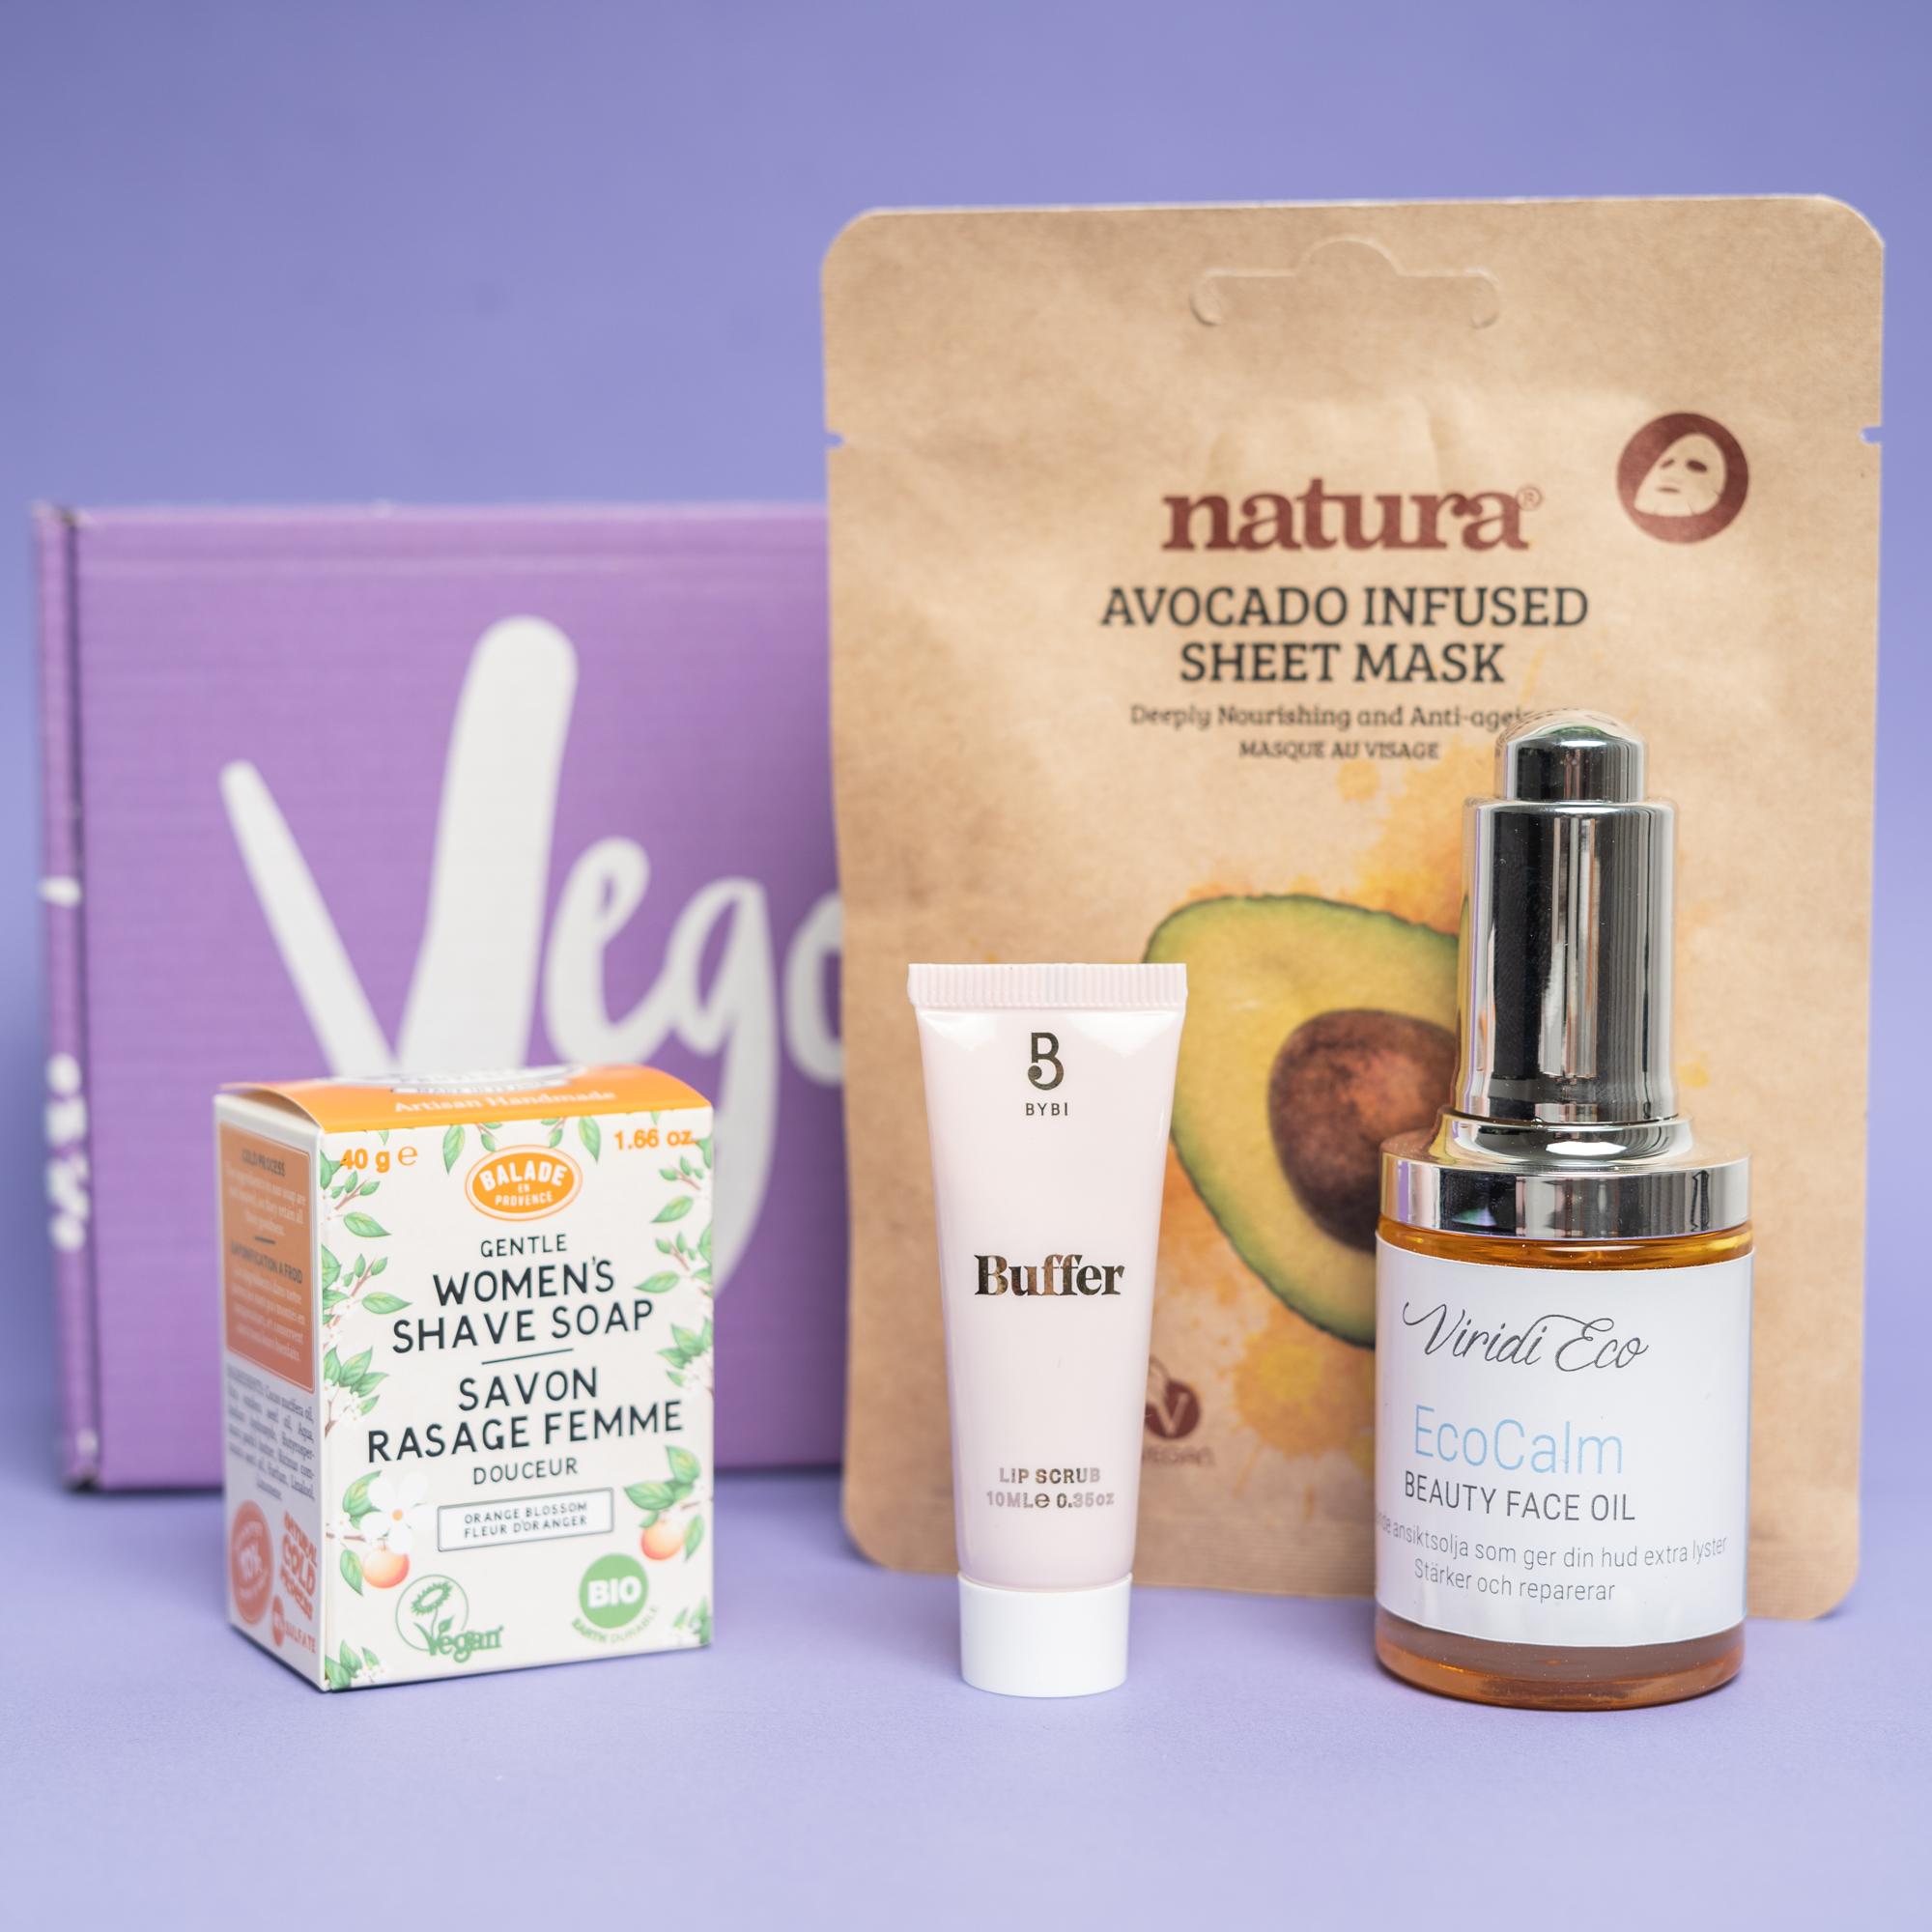 Vegobox - Beauty Box 1